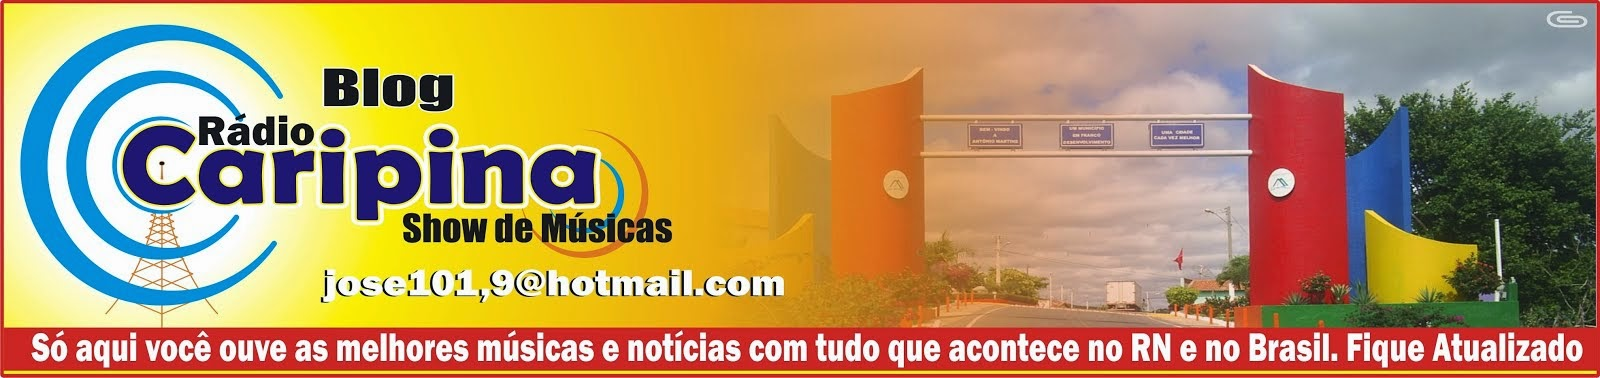 # Web Rádio Caripina #